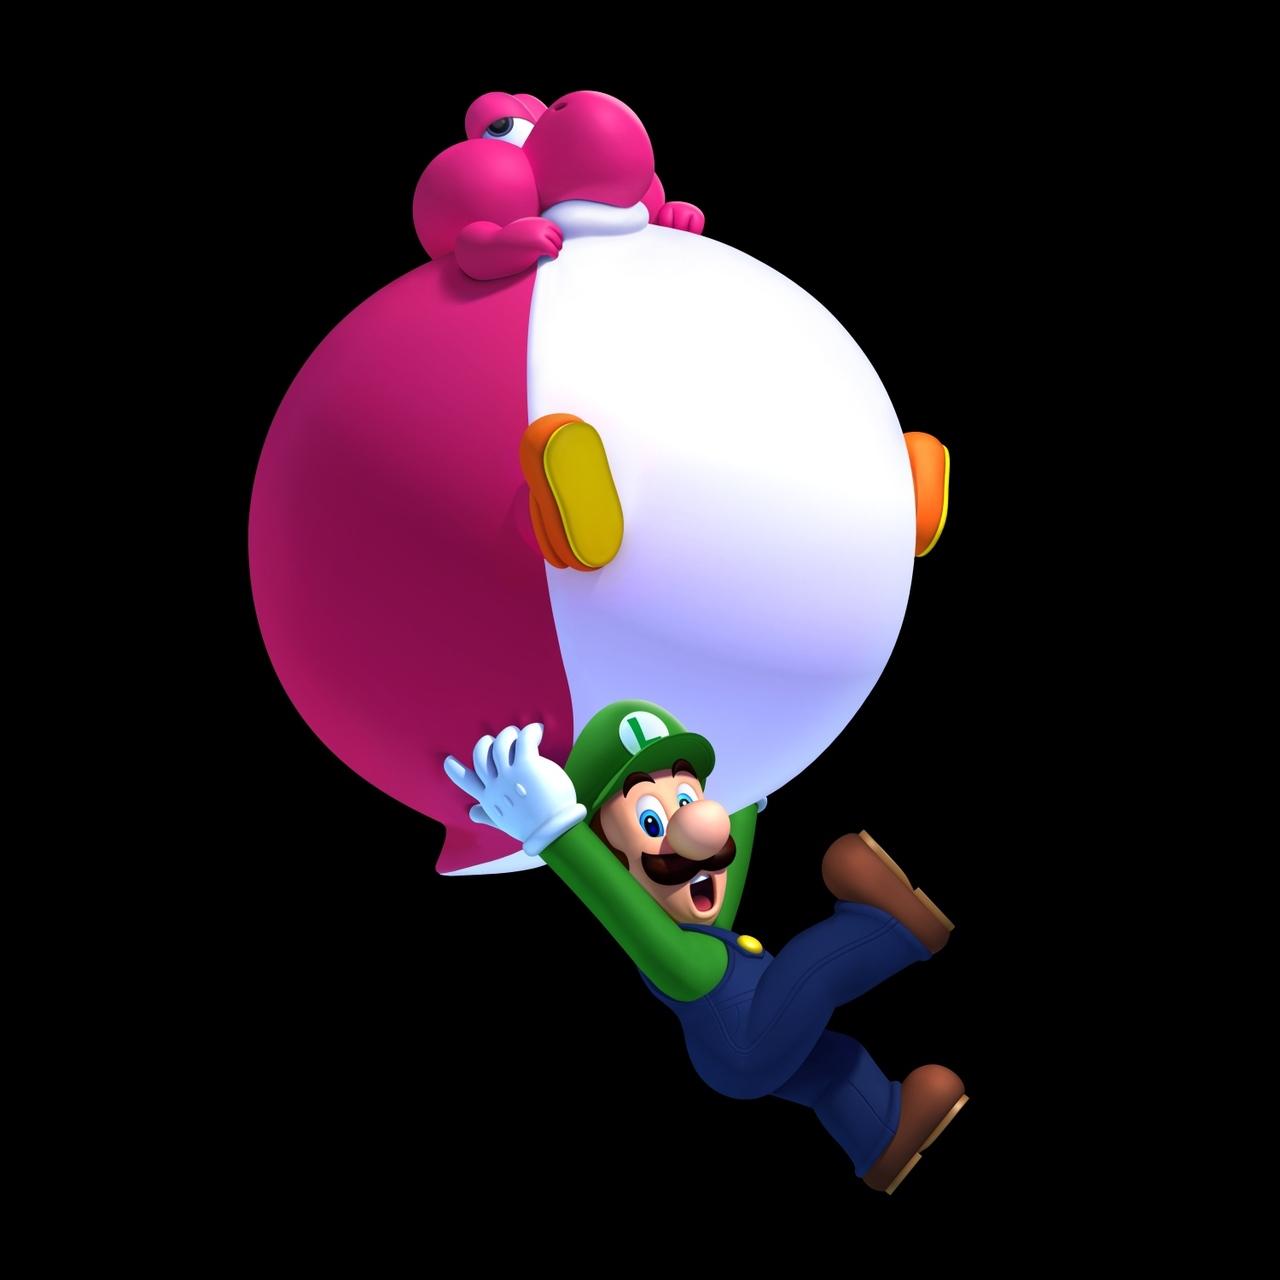 jeuxvideo.com New Super Mario Bros. U - Wii U Image 28 sur 266